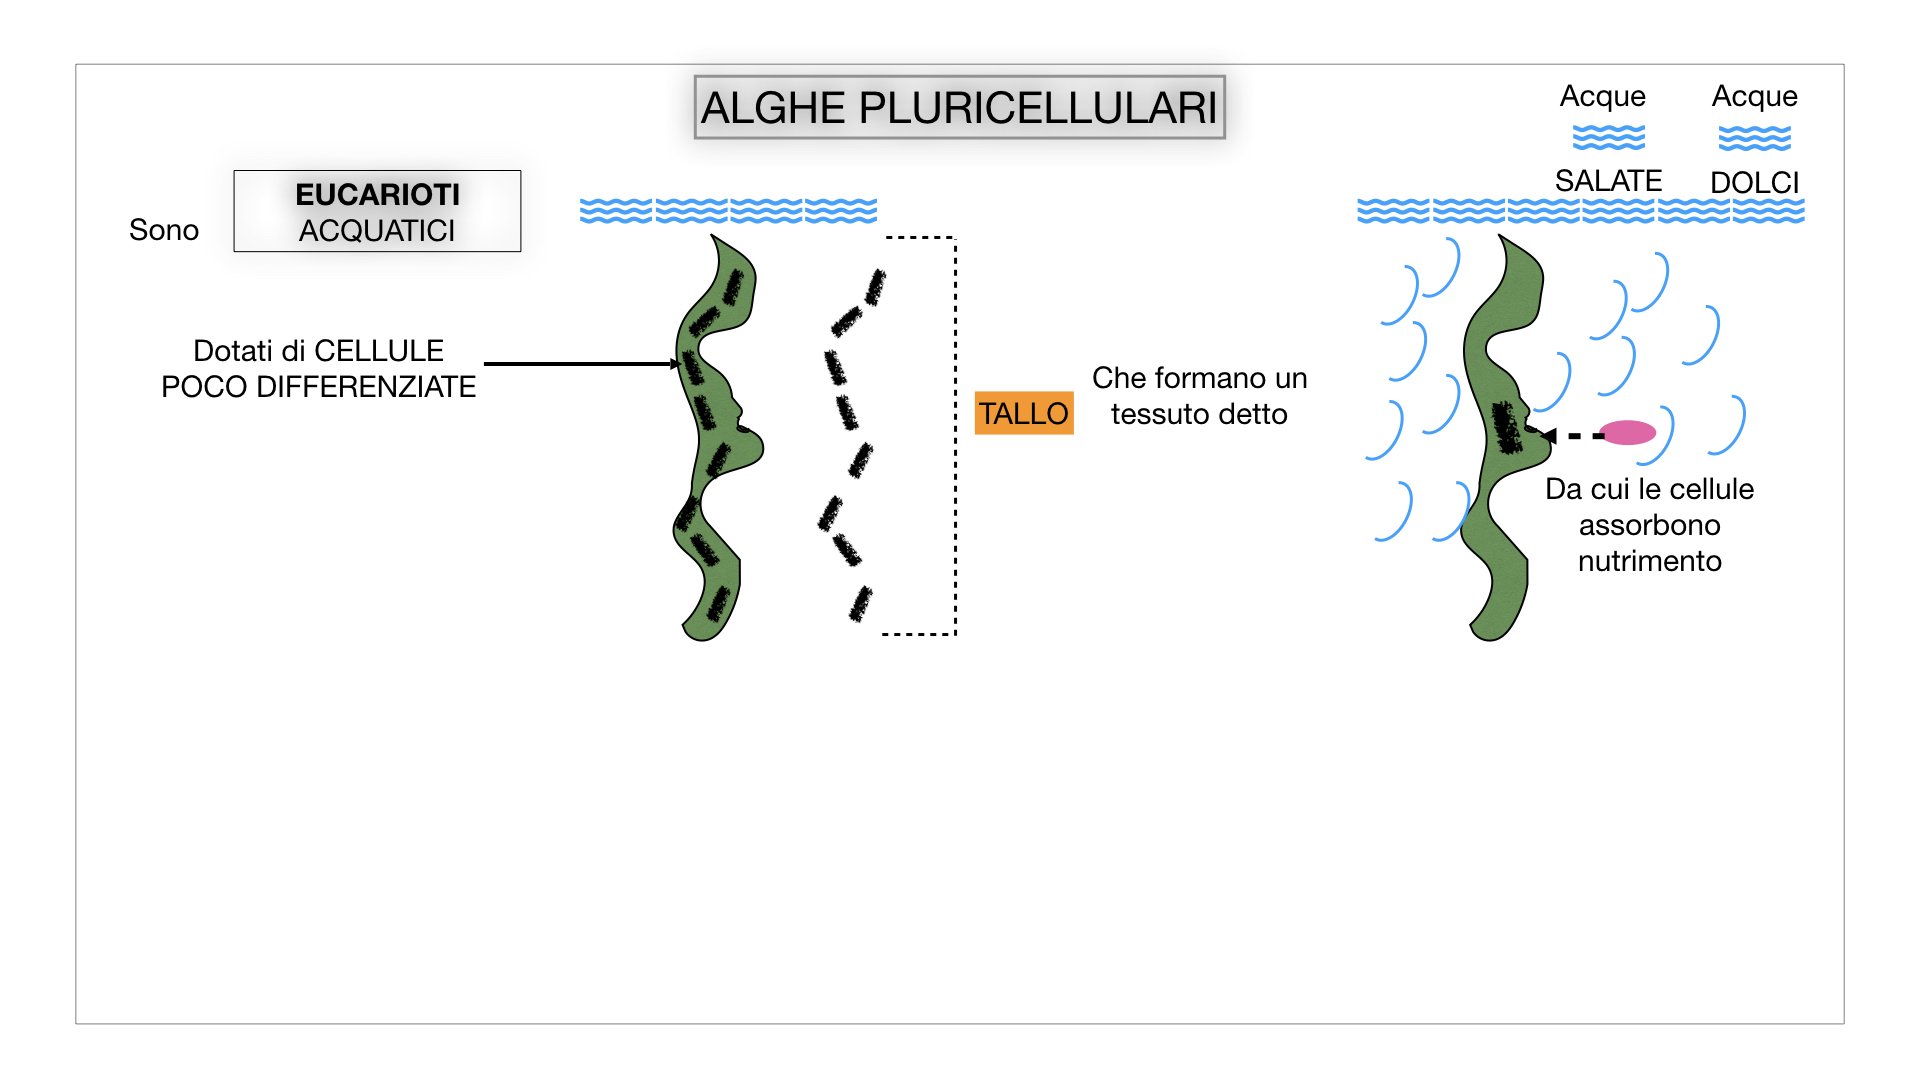 8. alghe uni_pluri_cellulari_SIMULAZIONE.028